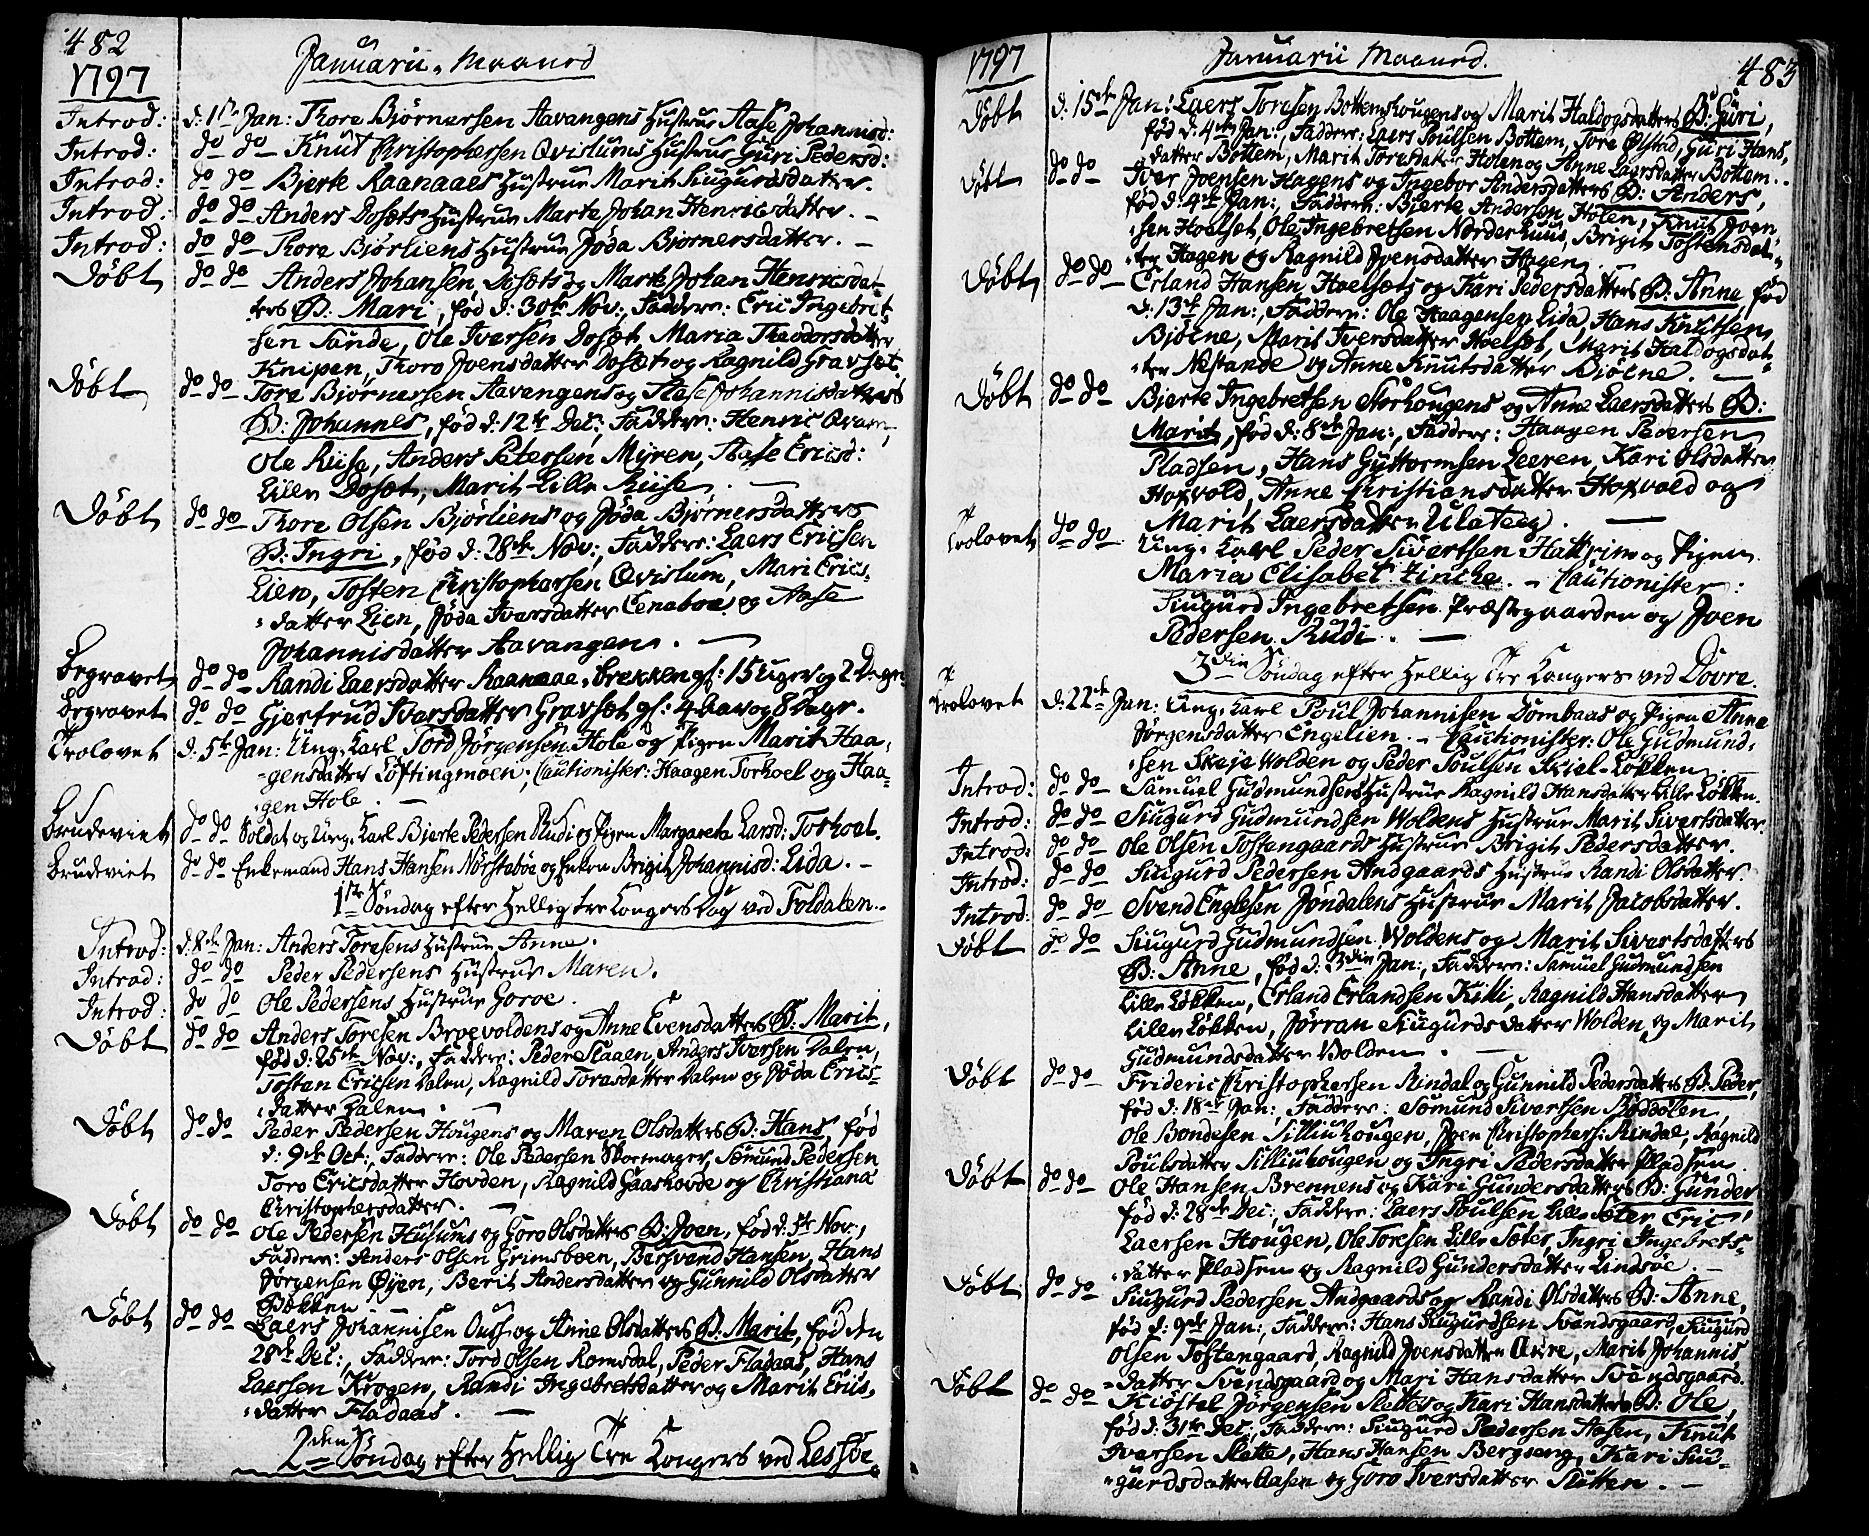 SAH, Lesja prestekontor, Ministerialbok nr. 3, 1777-1819, s. 482-483